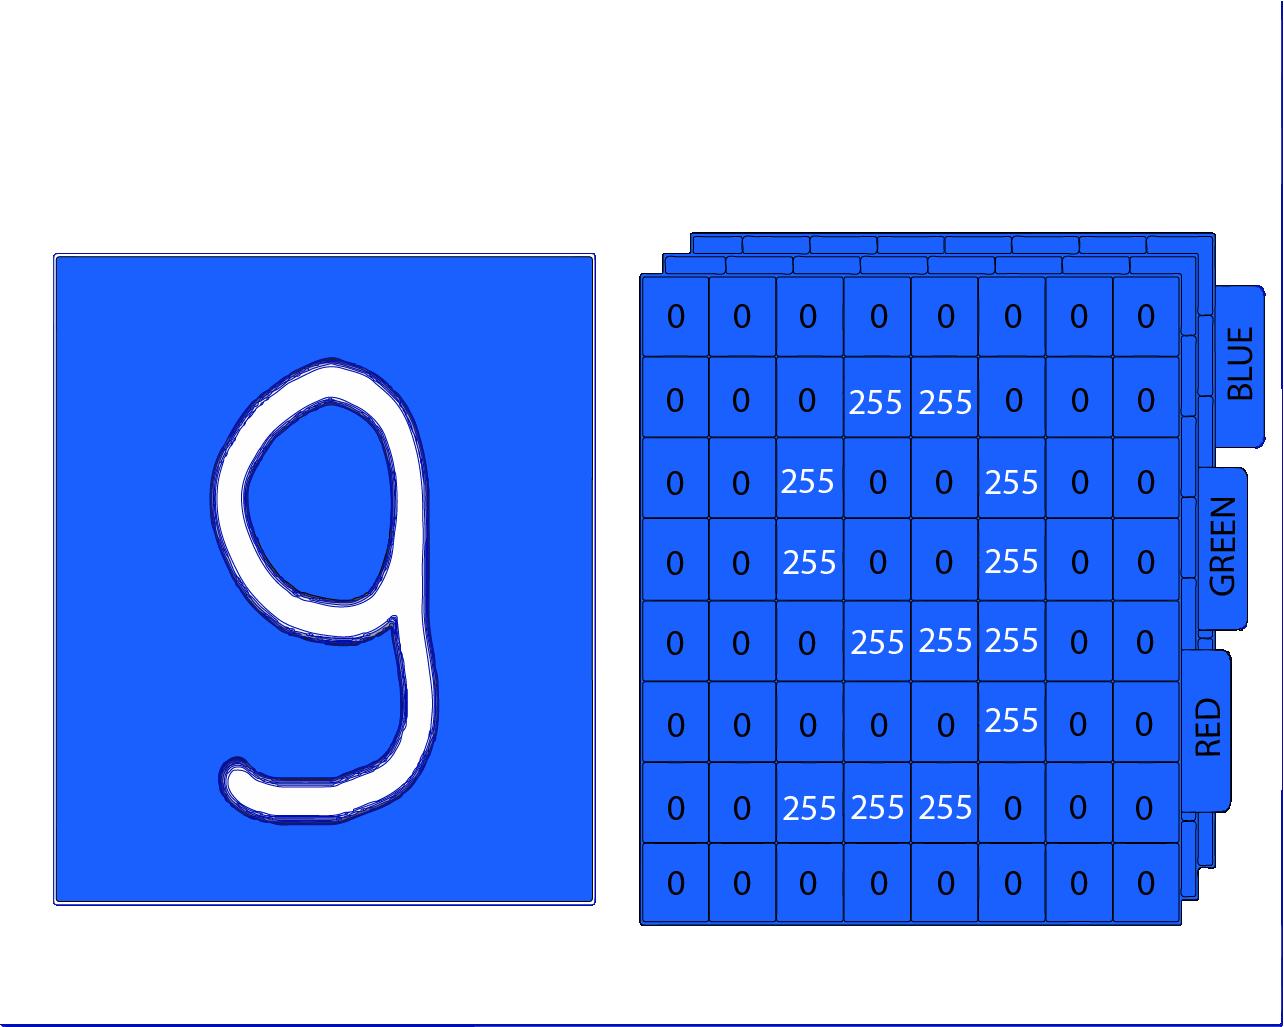 Propriedades dos dígitos